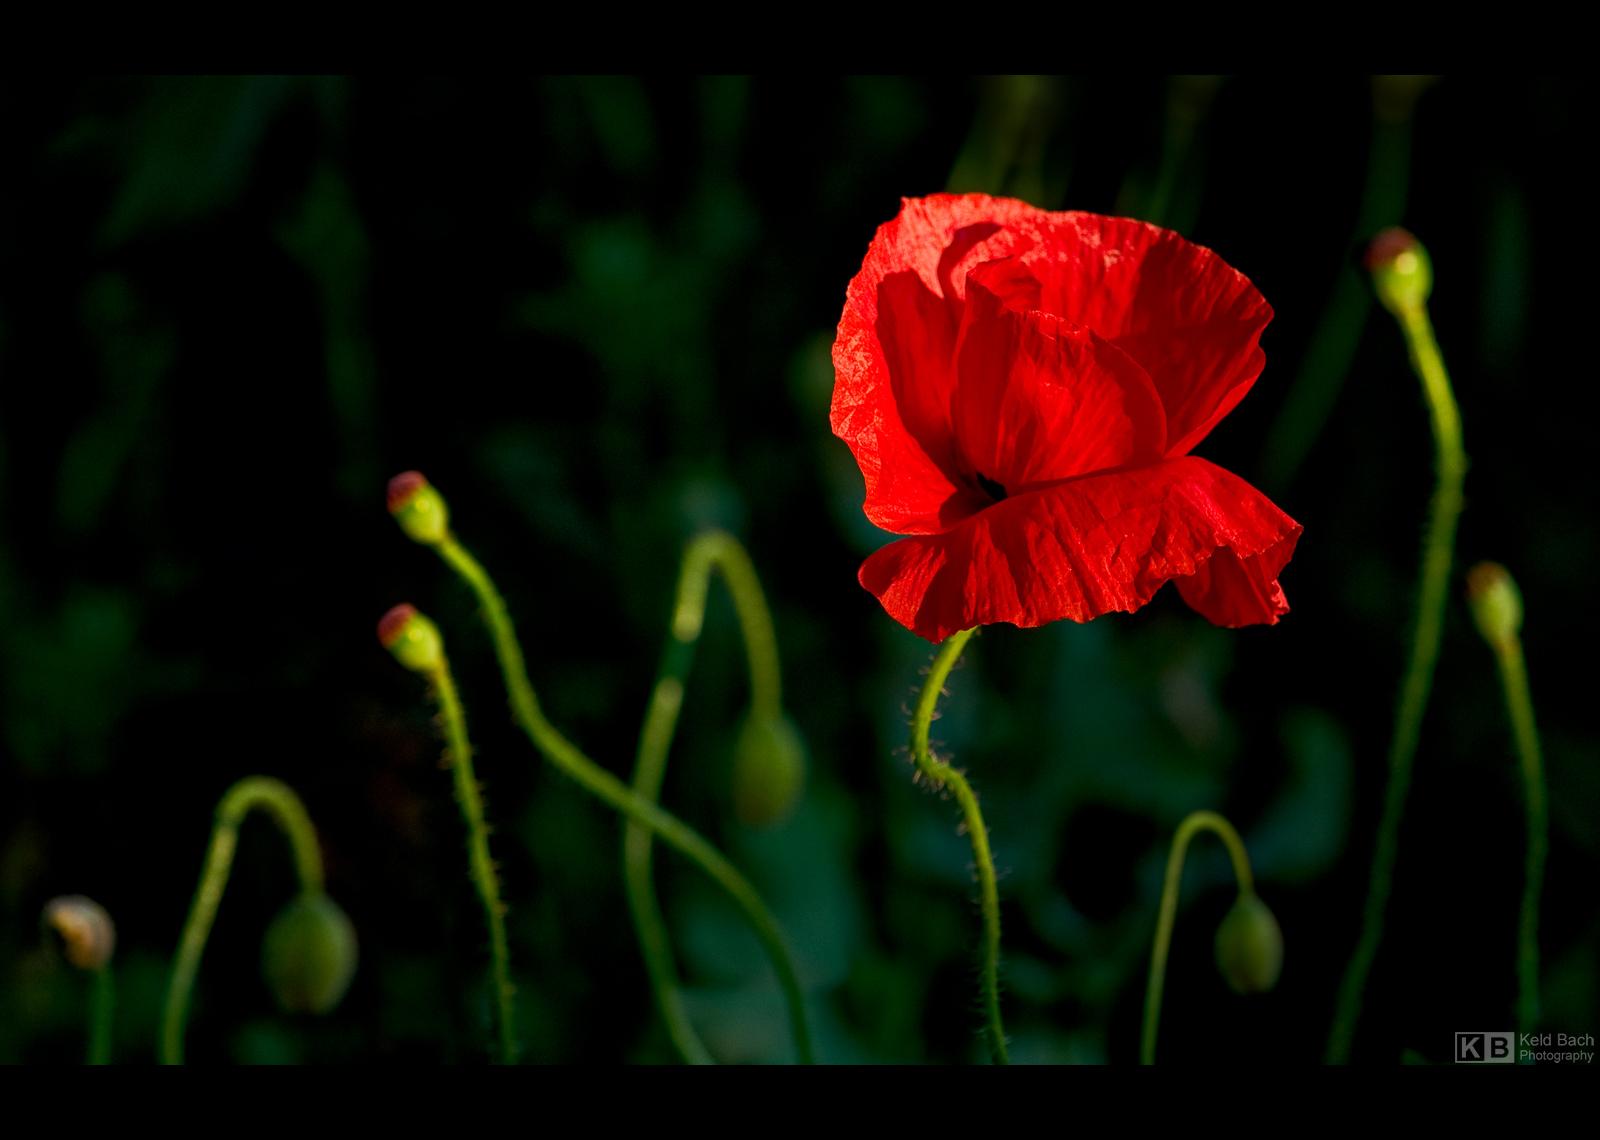 The Scarlet Pimpernel by KeldBach